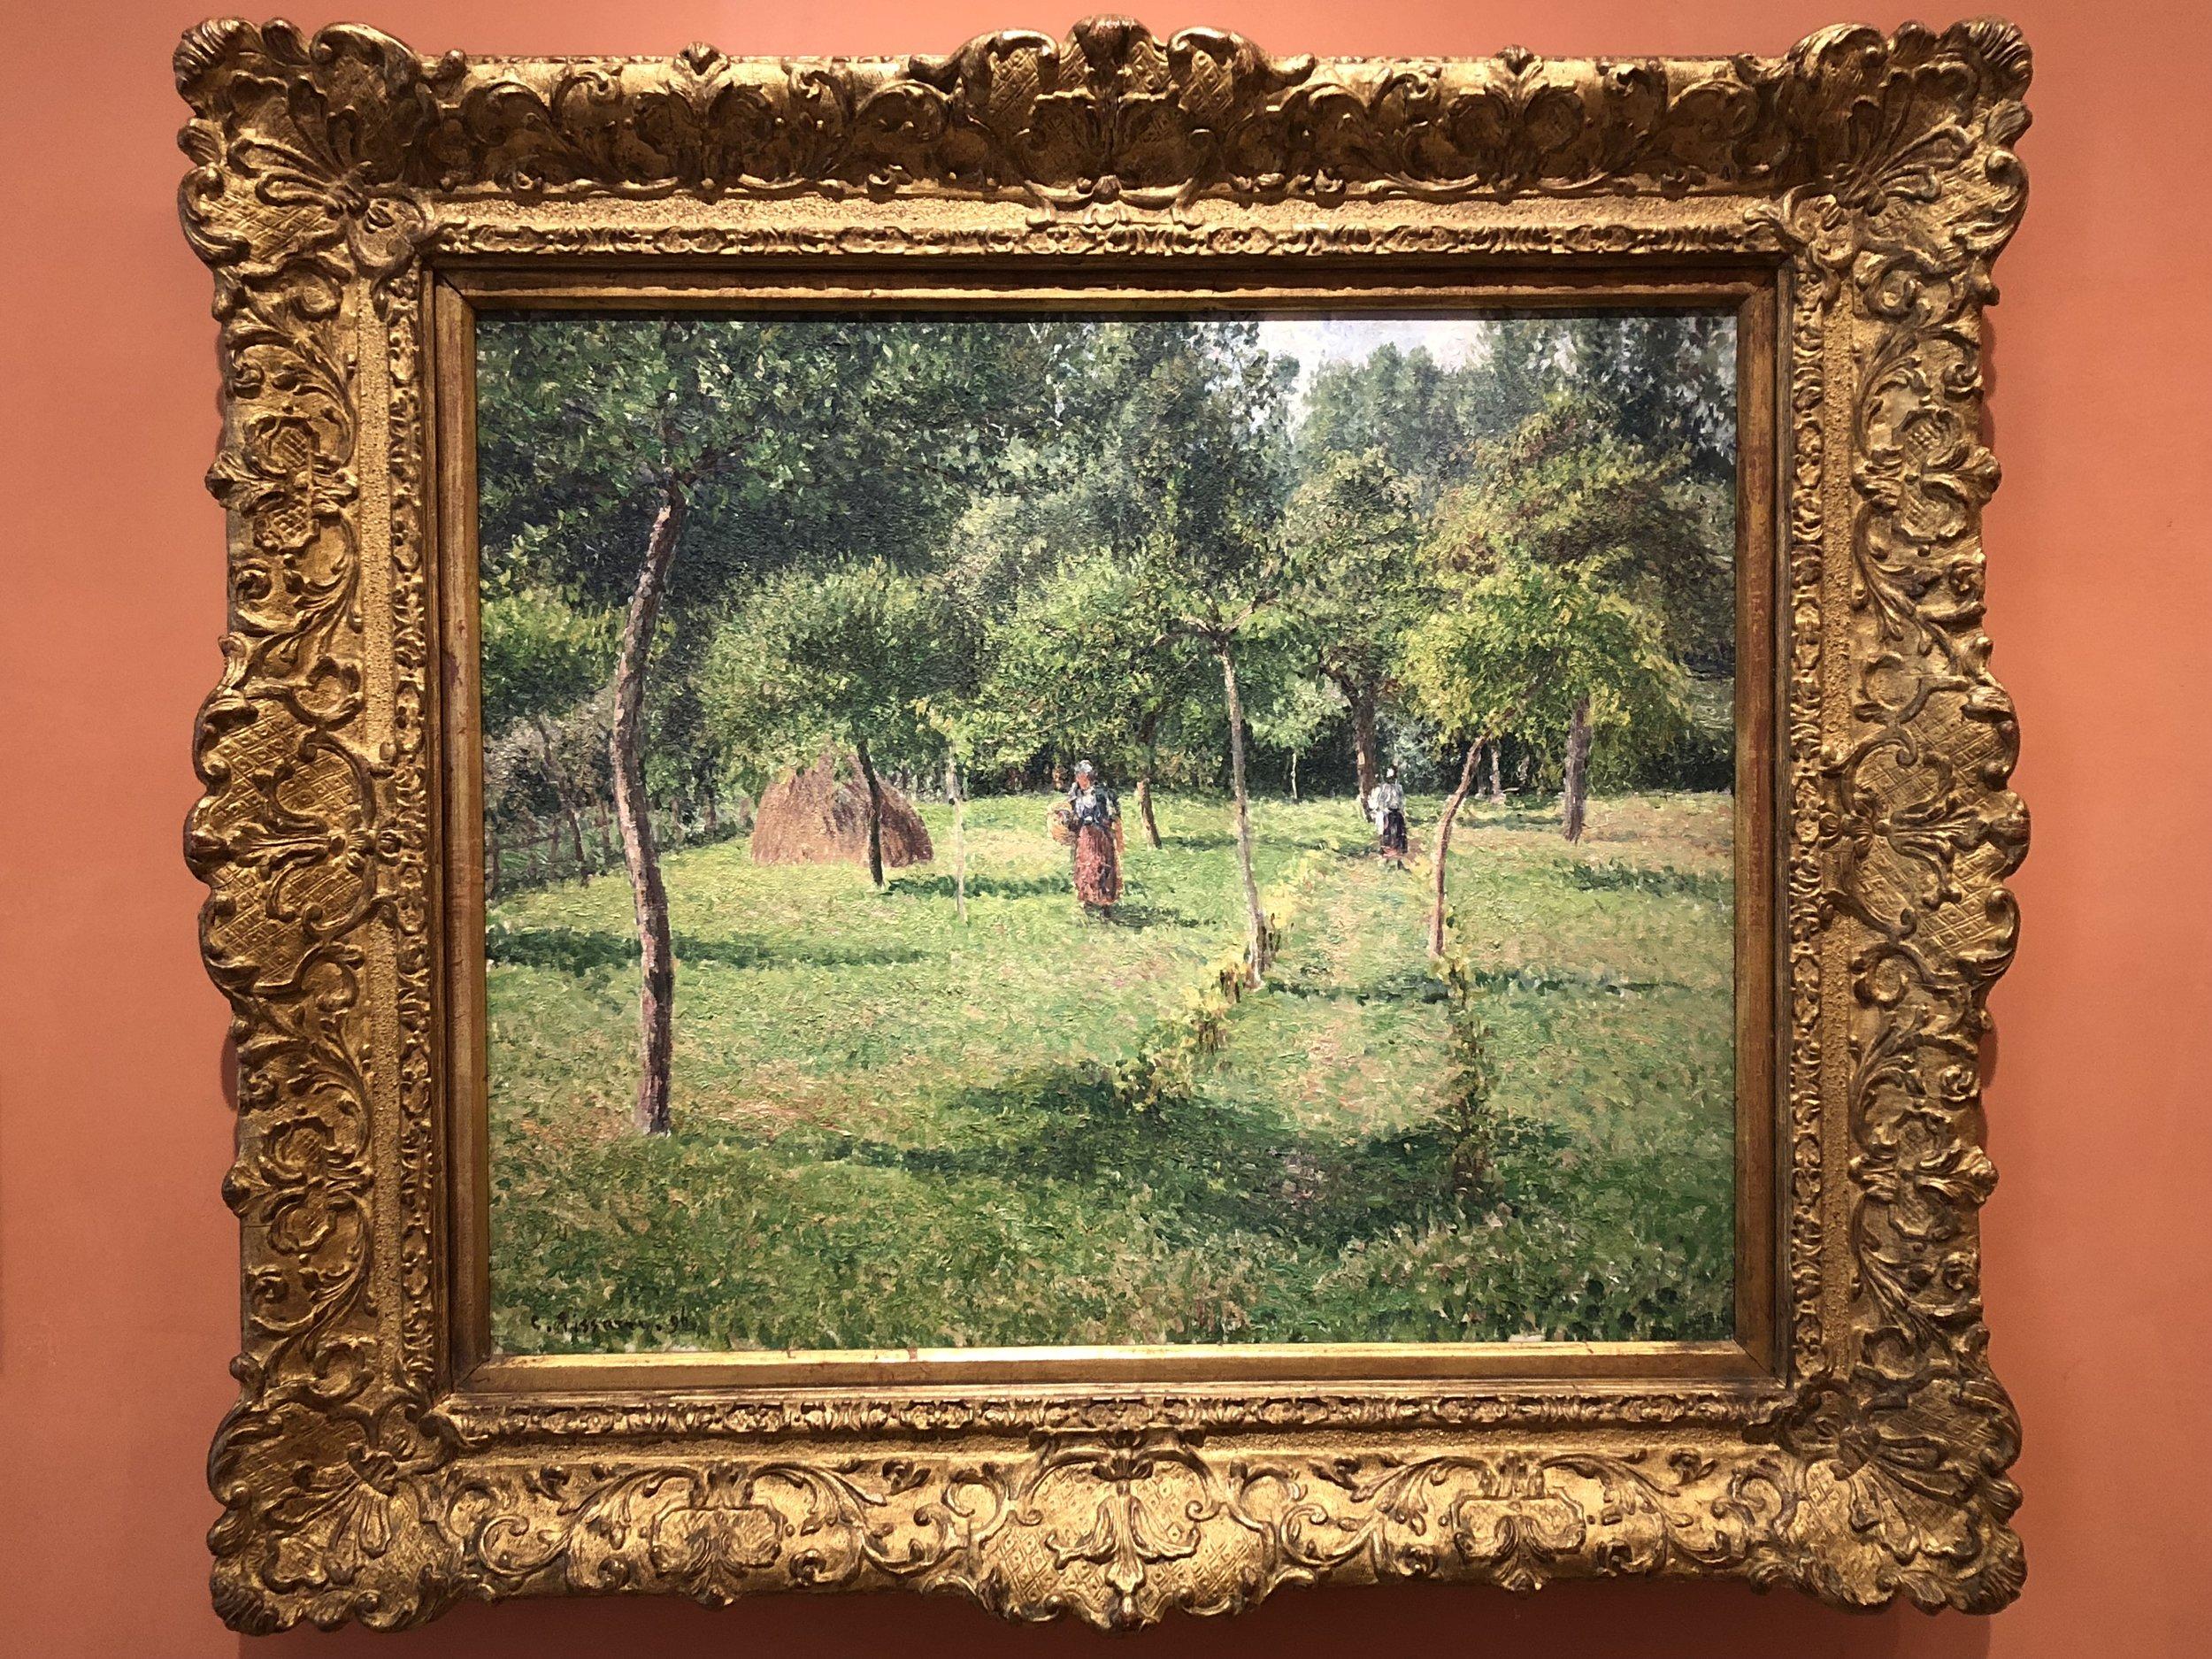 Camille Pissarro  The Orchard at Eragny, 1896